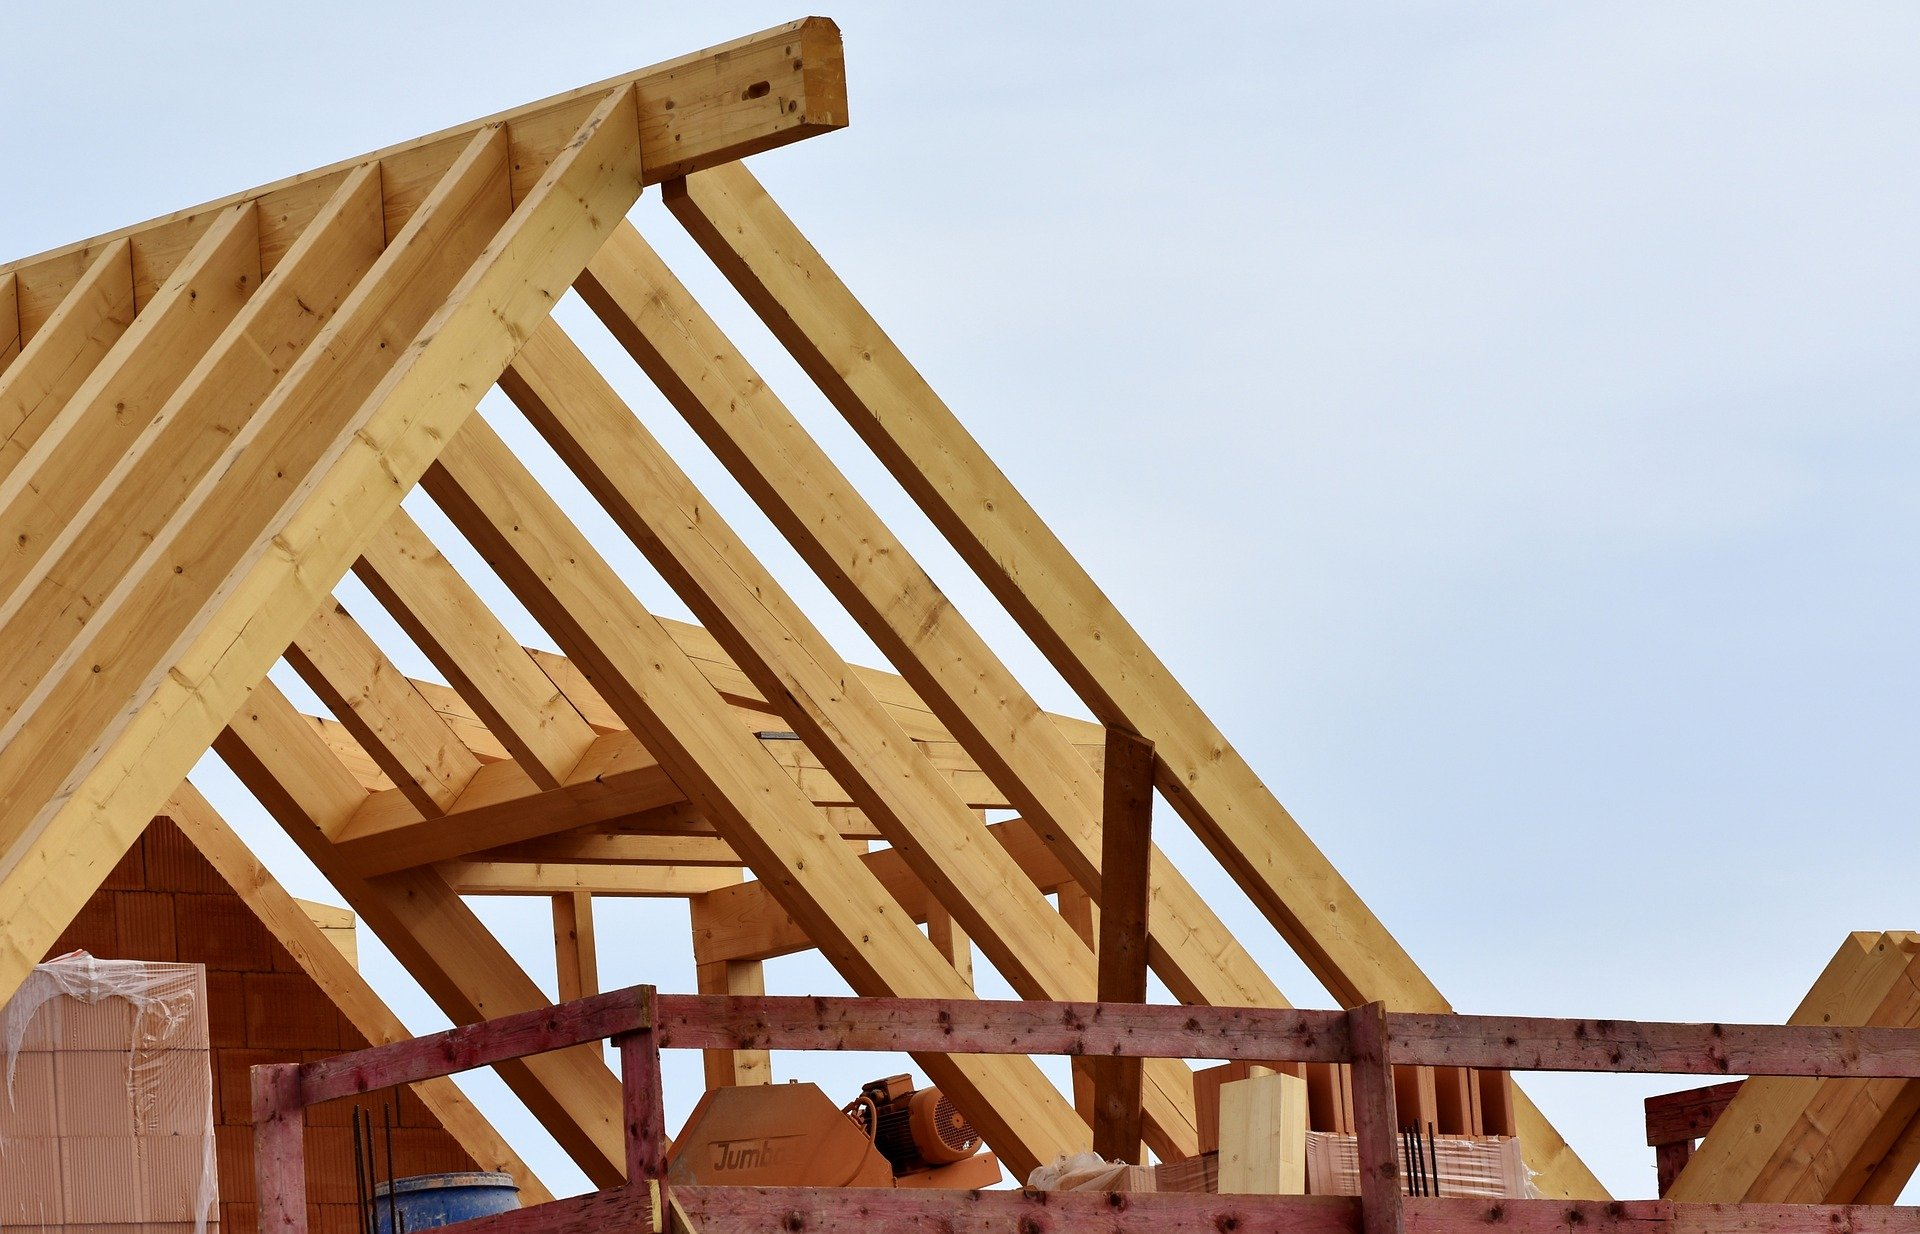 Foto houten dakconstructie